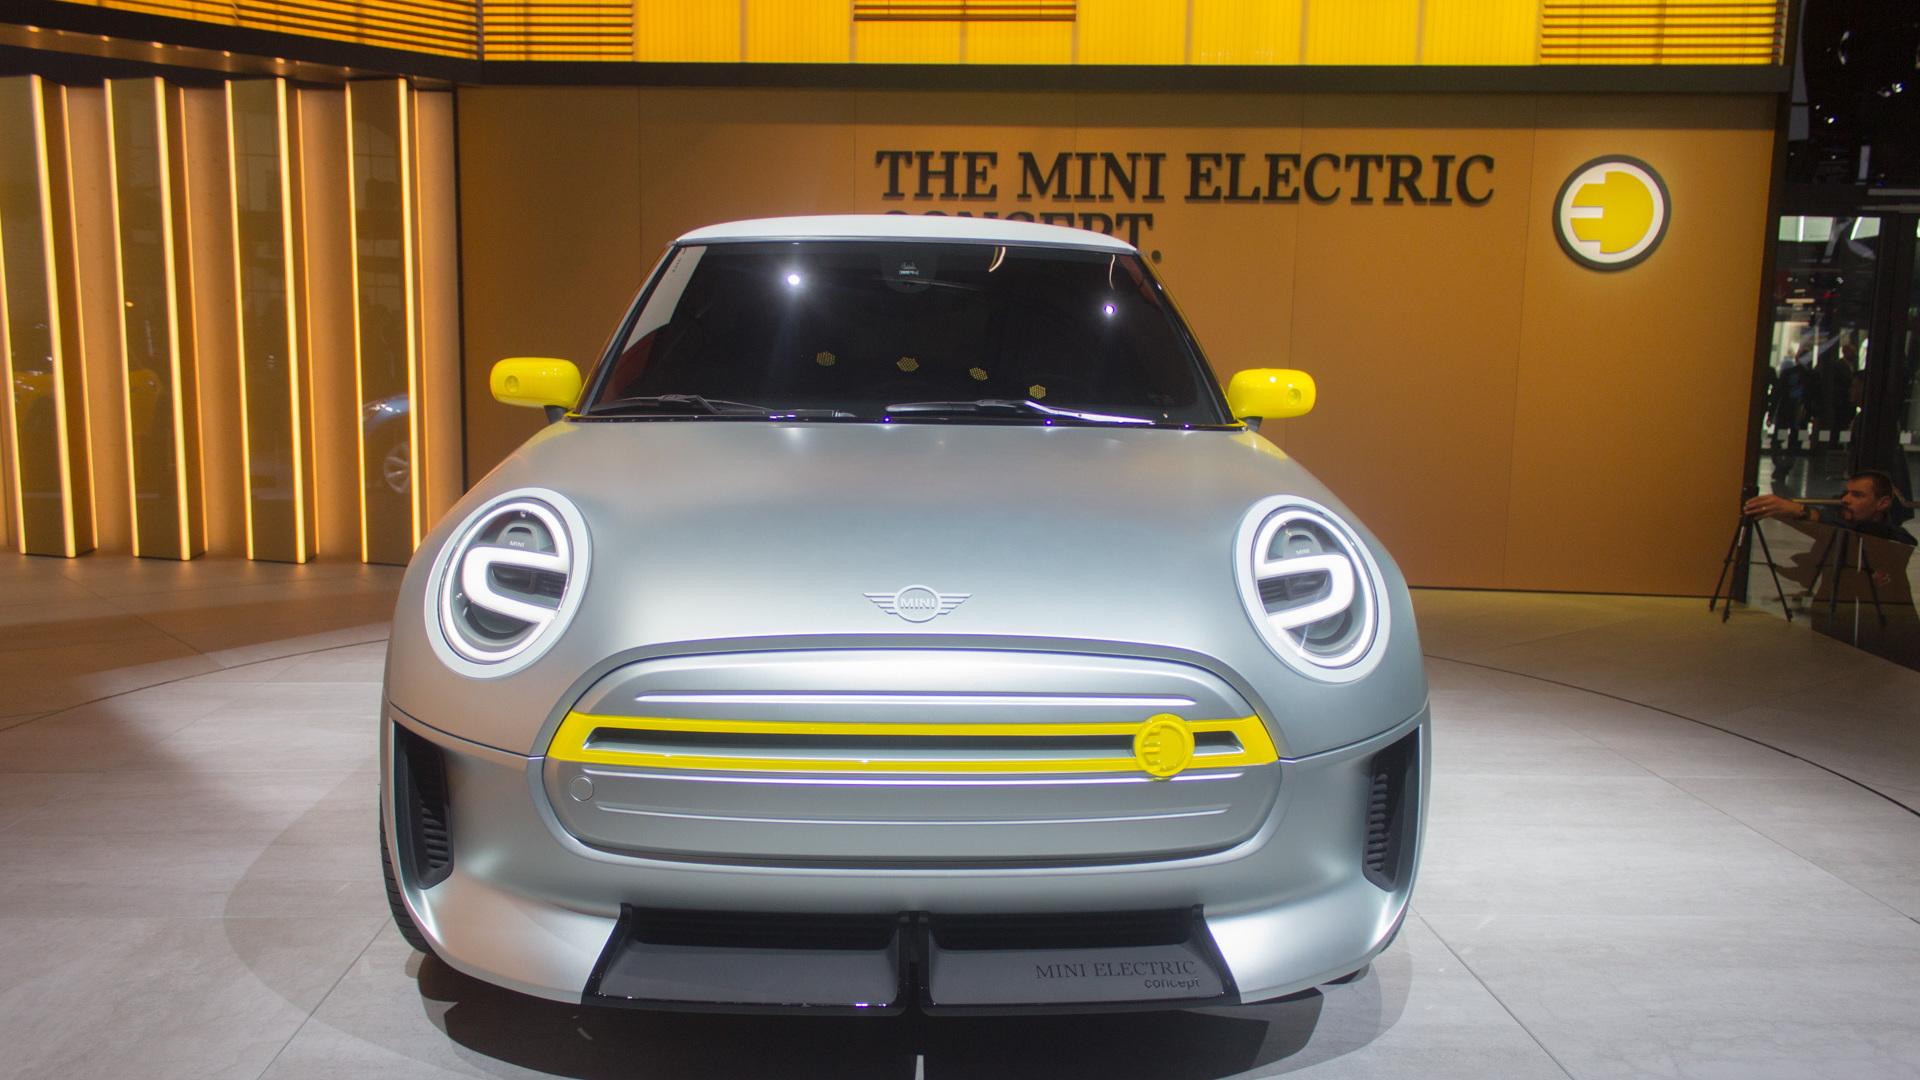 Mini Electric Concept, 2017 Frankfurt Motor Show